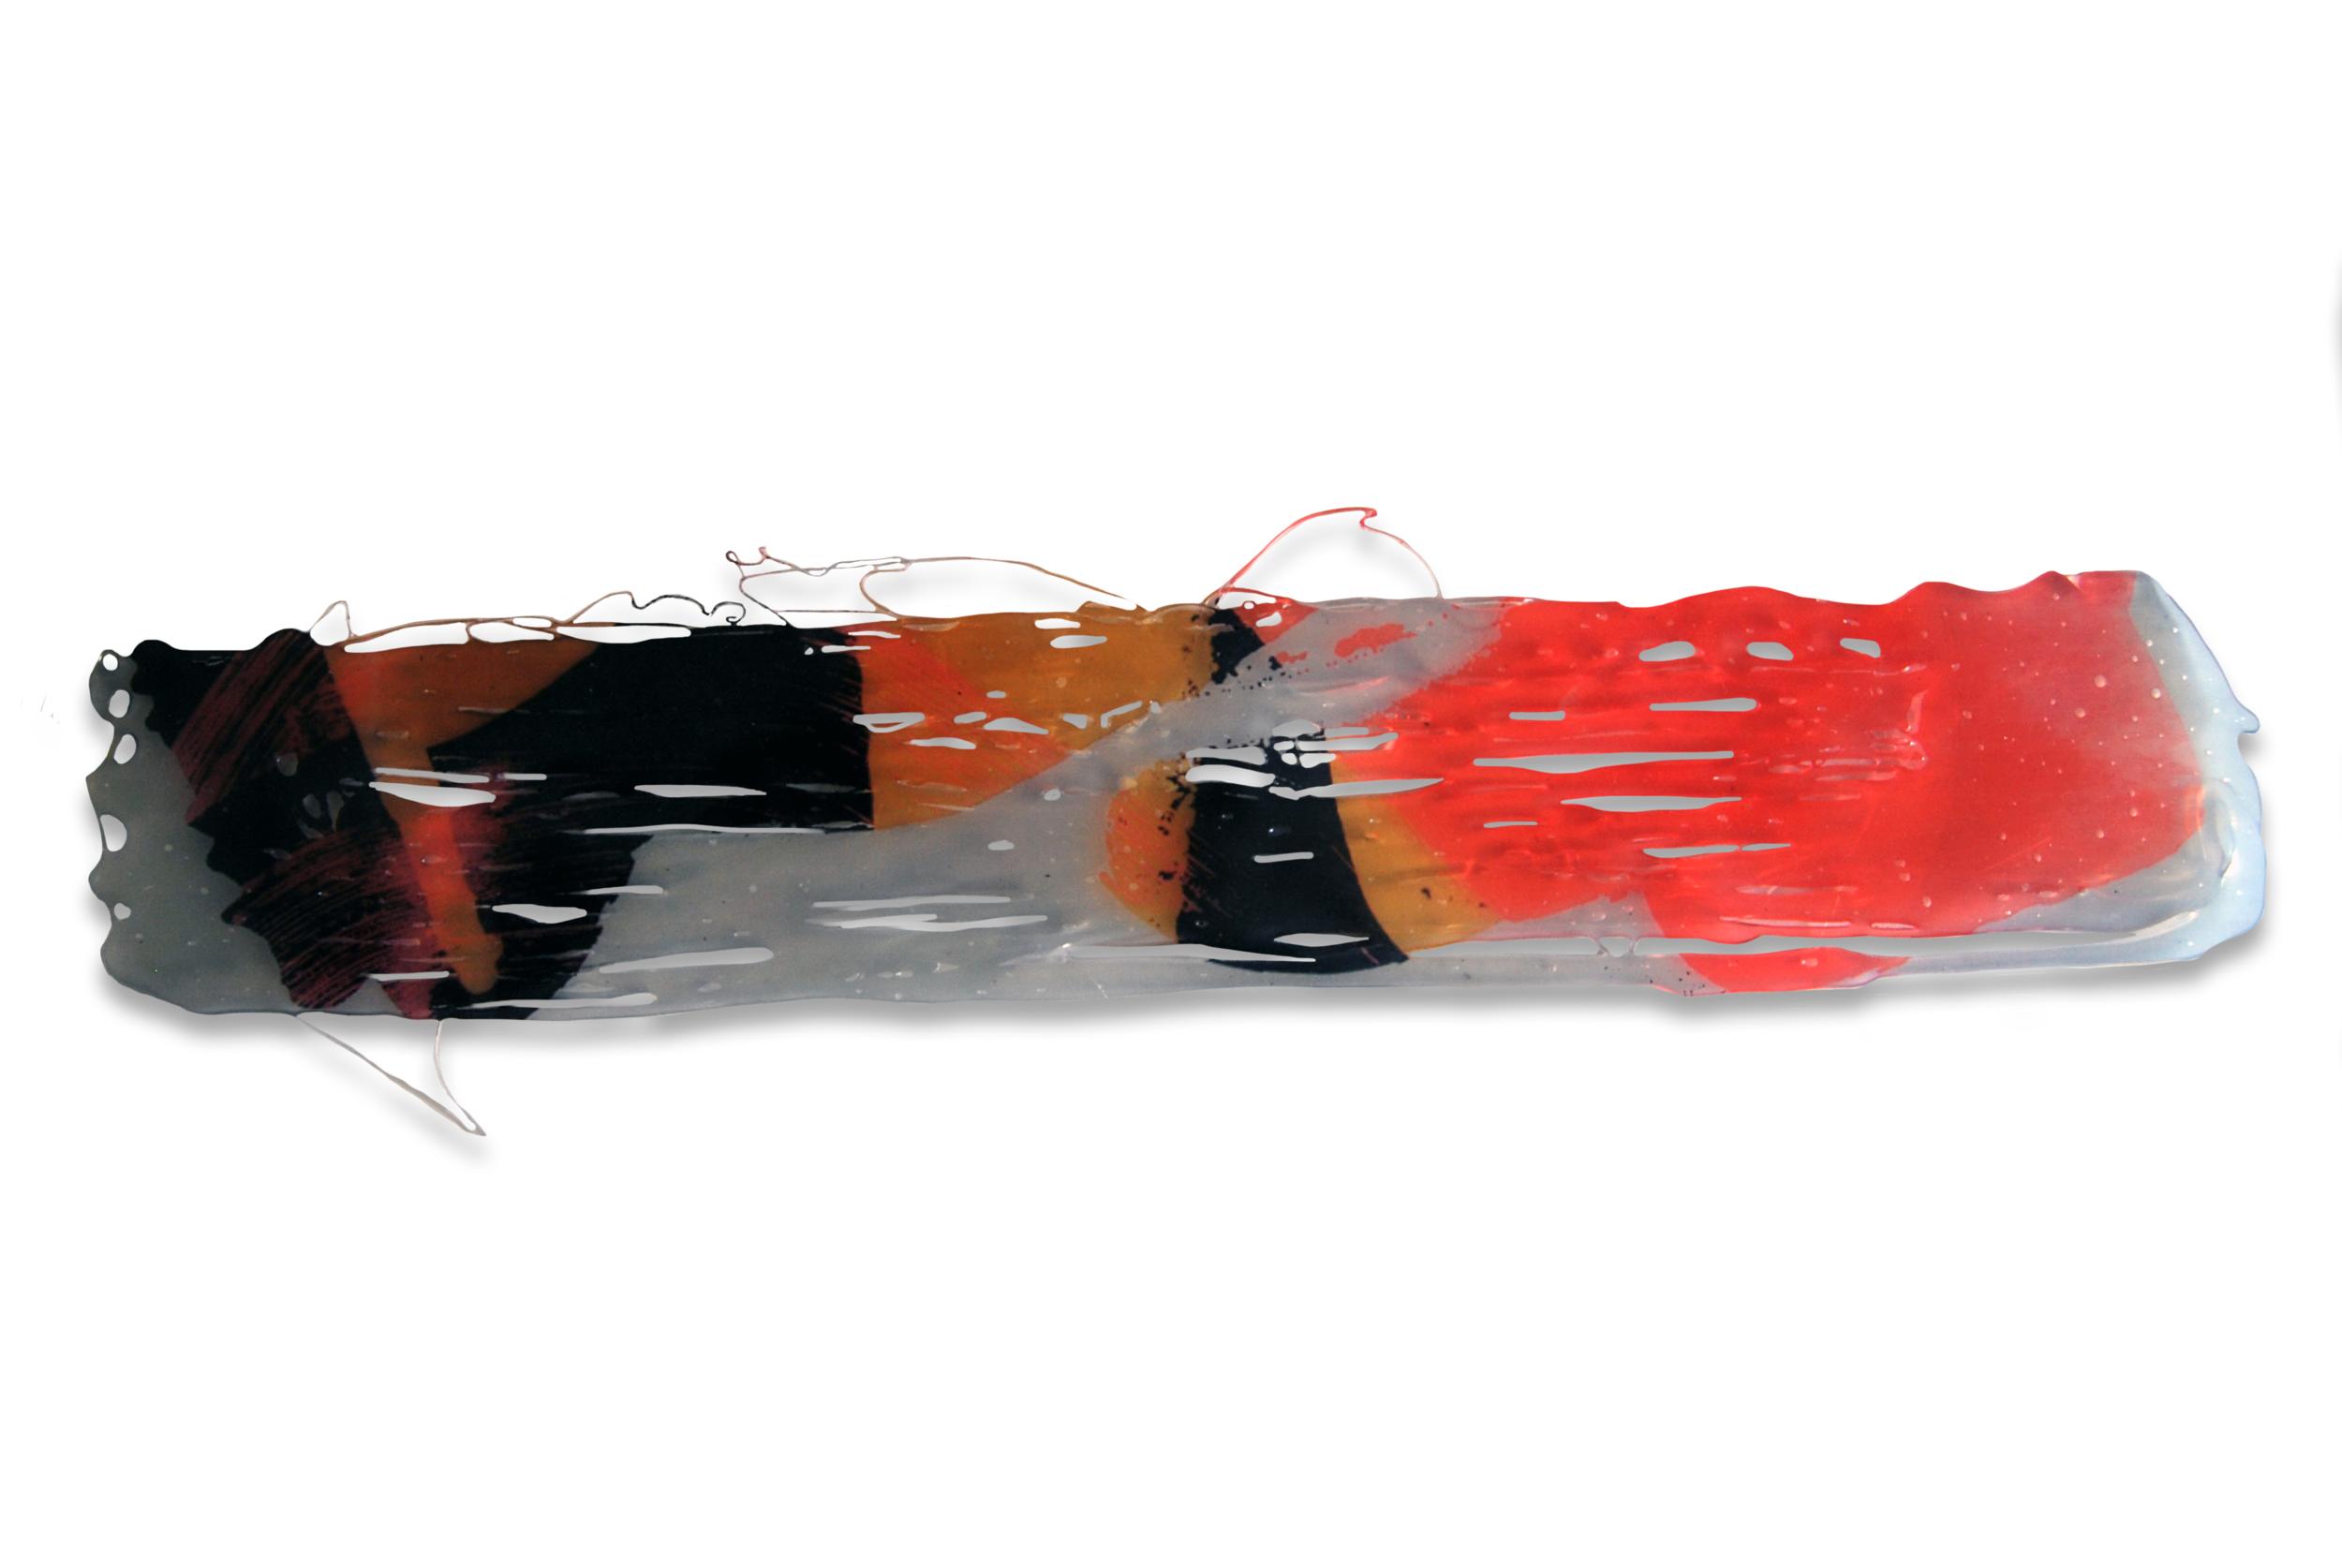 TRANSFER nº4, 2015, Transferencia Digital sobre cola termofusible. 5,5 x 38 cm